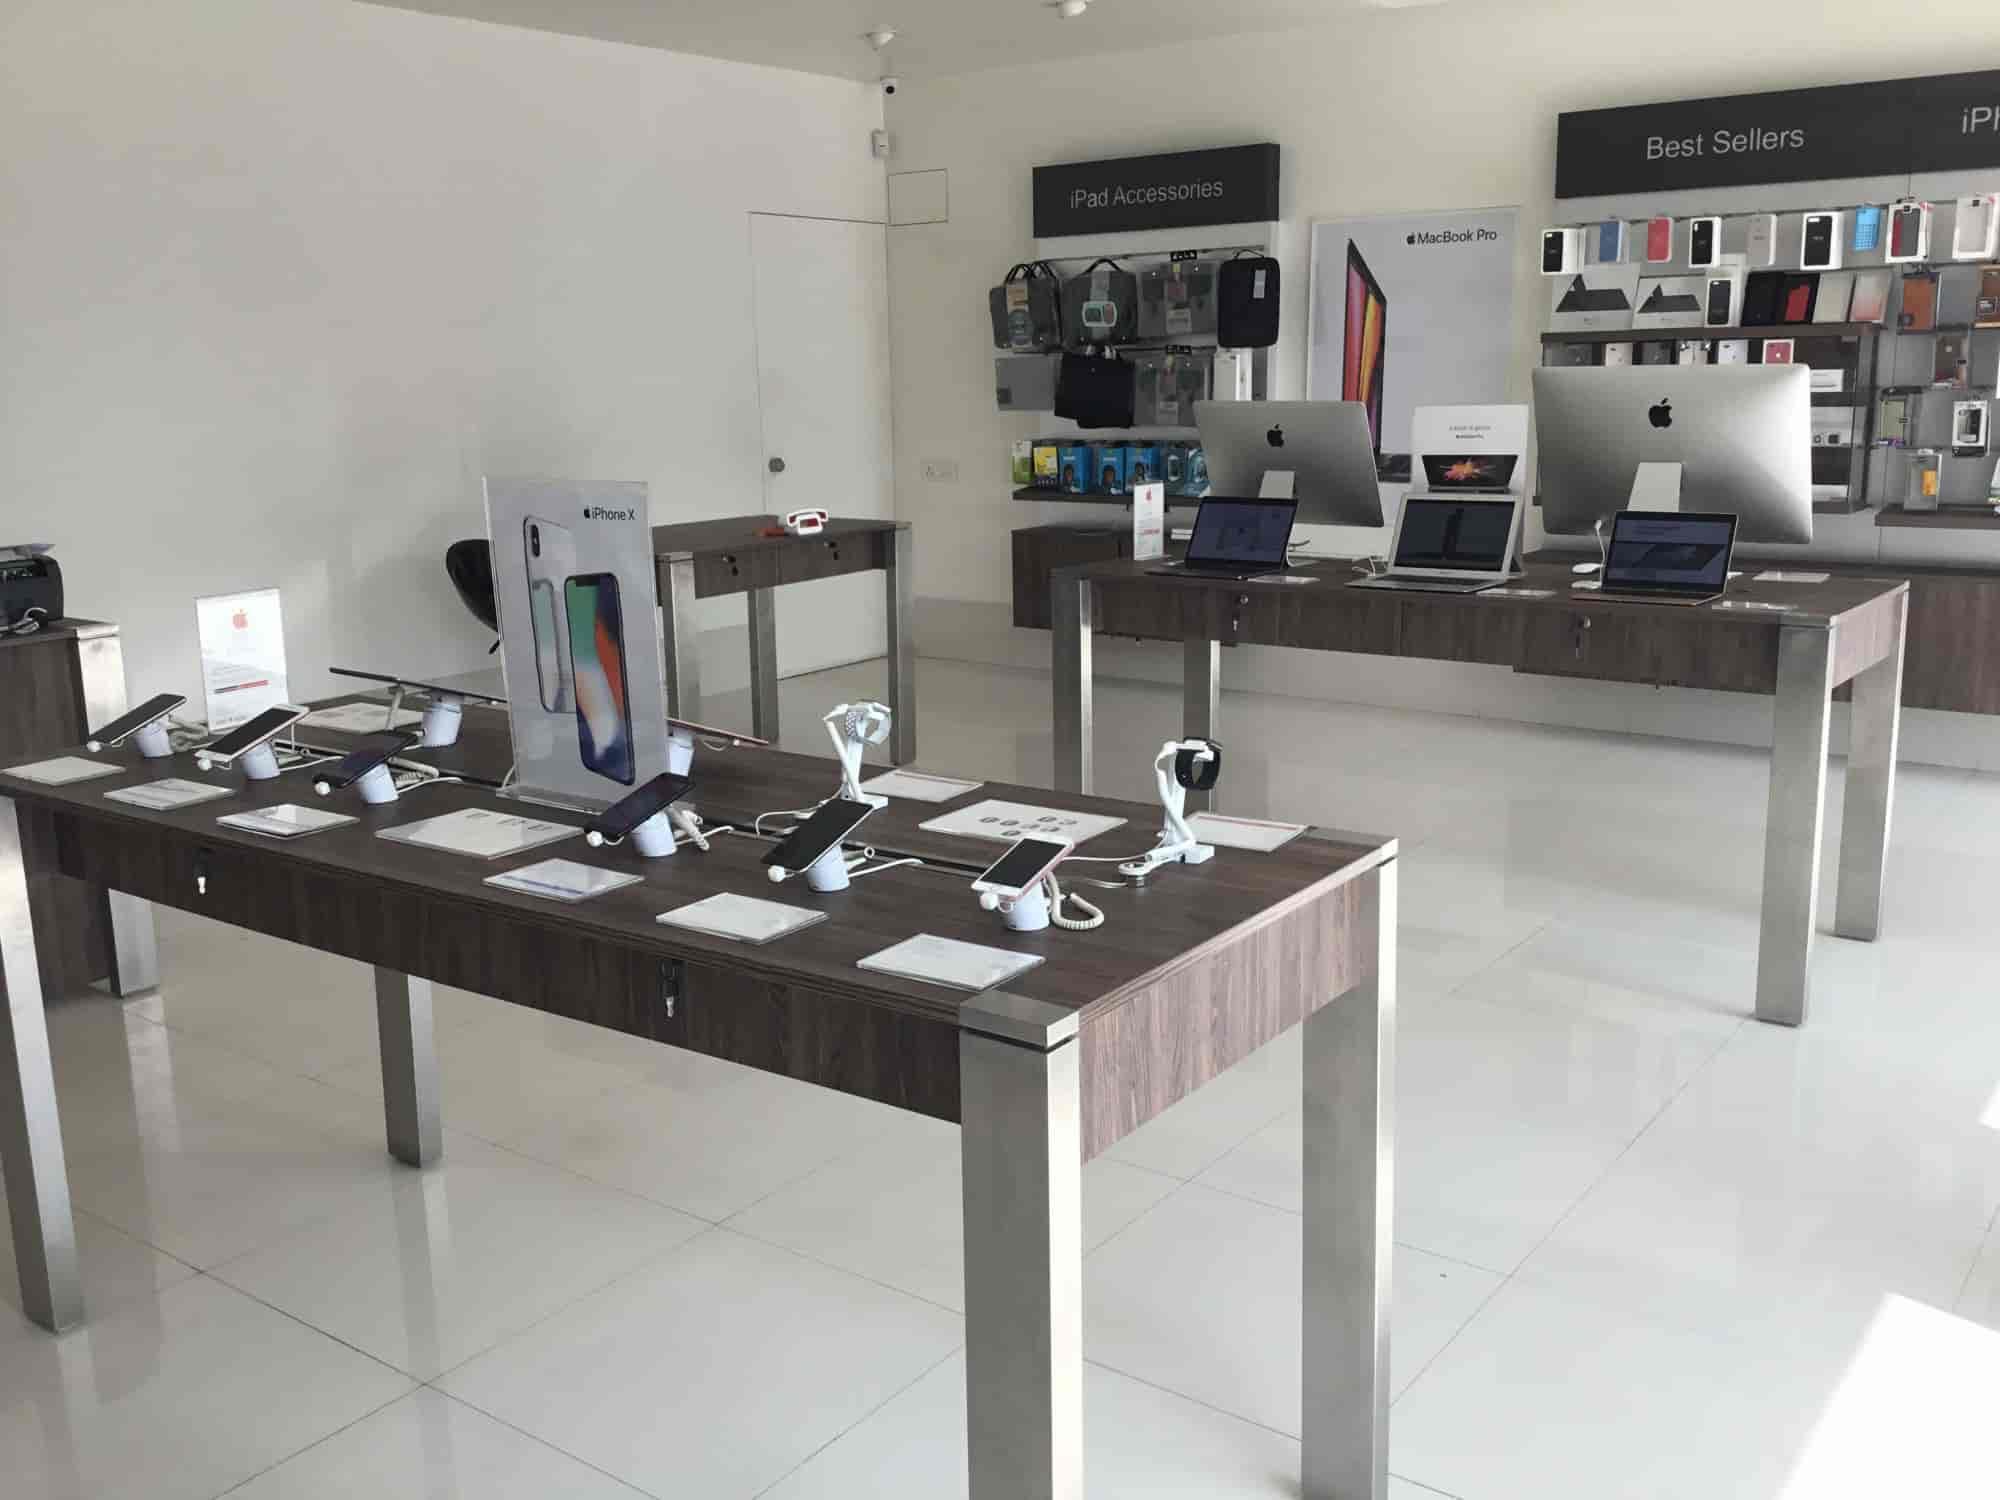 c2ef303edf1a41 Apple Store I Magic, Akota - Mobile Phone Dealers-iPhone in Vadodara -  Justdial